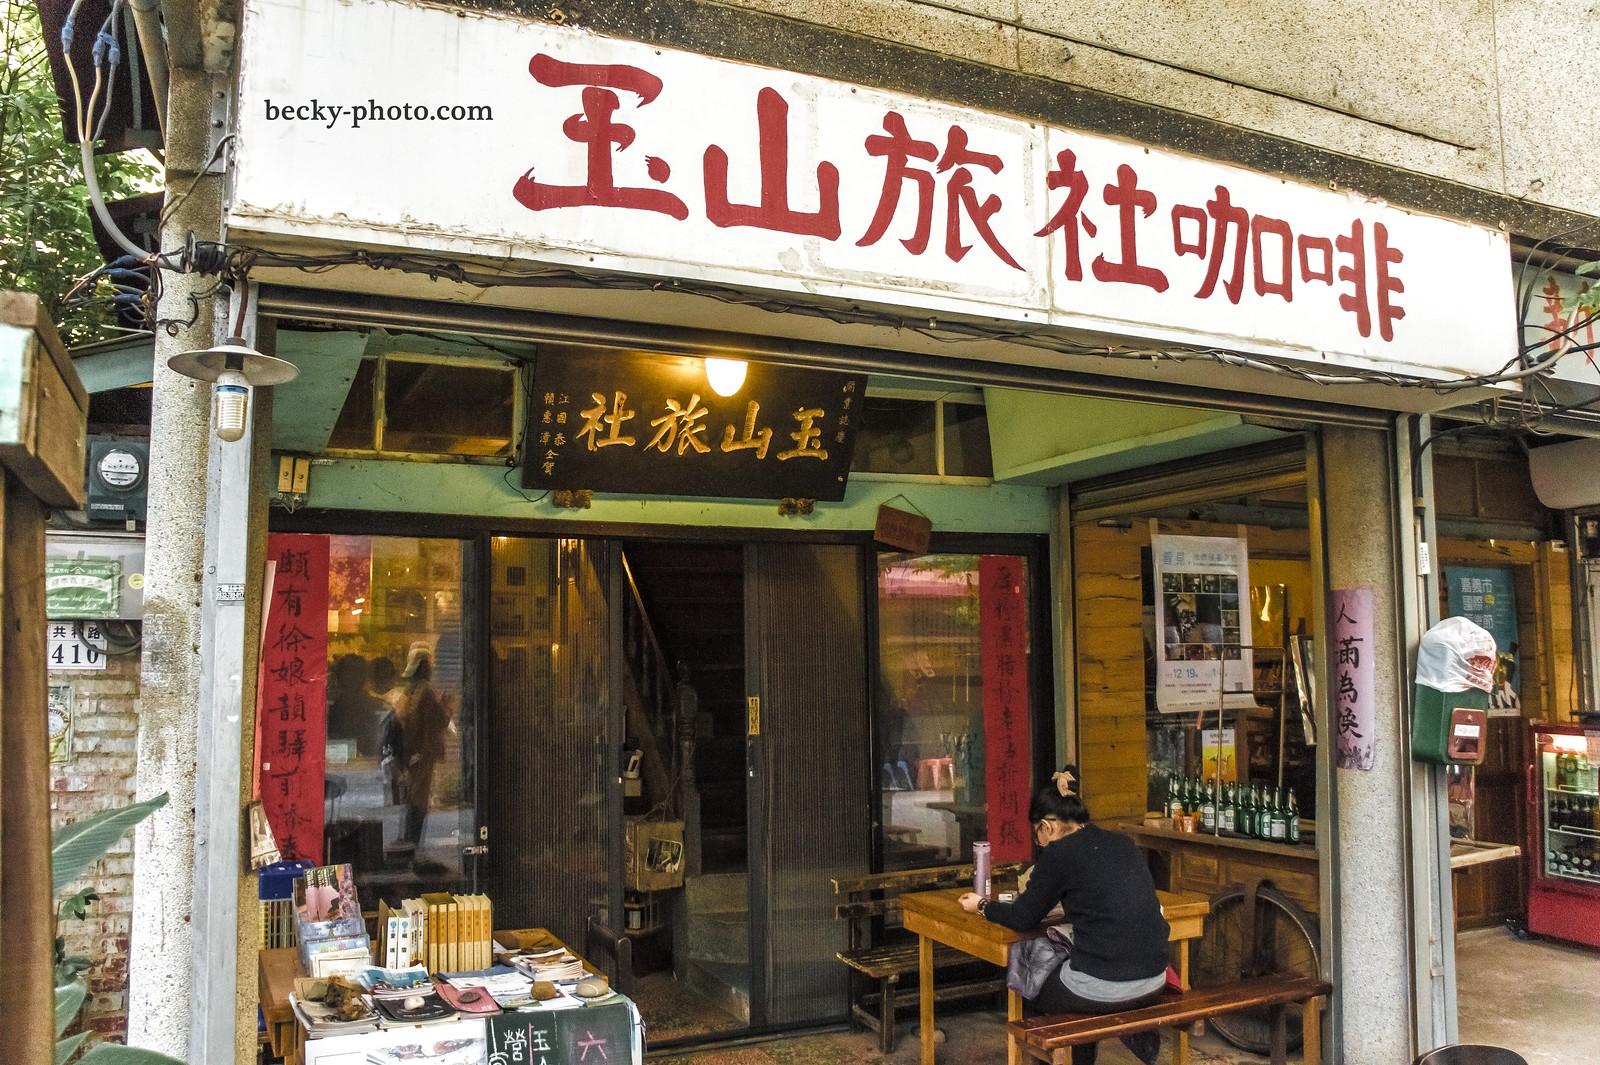 2014.Dec 嘉義老房子之旅 Chiayi